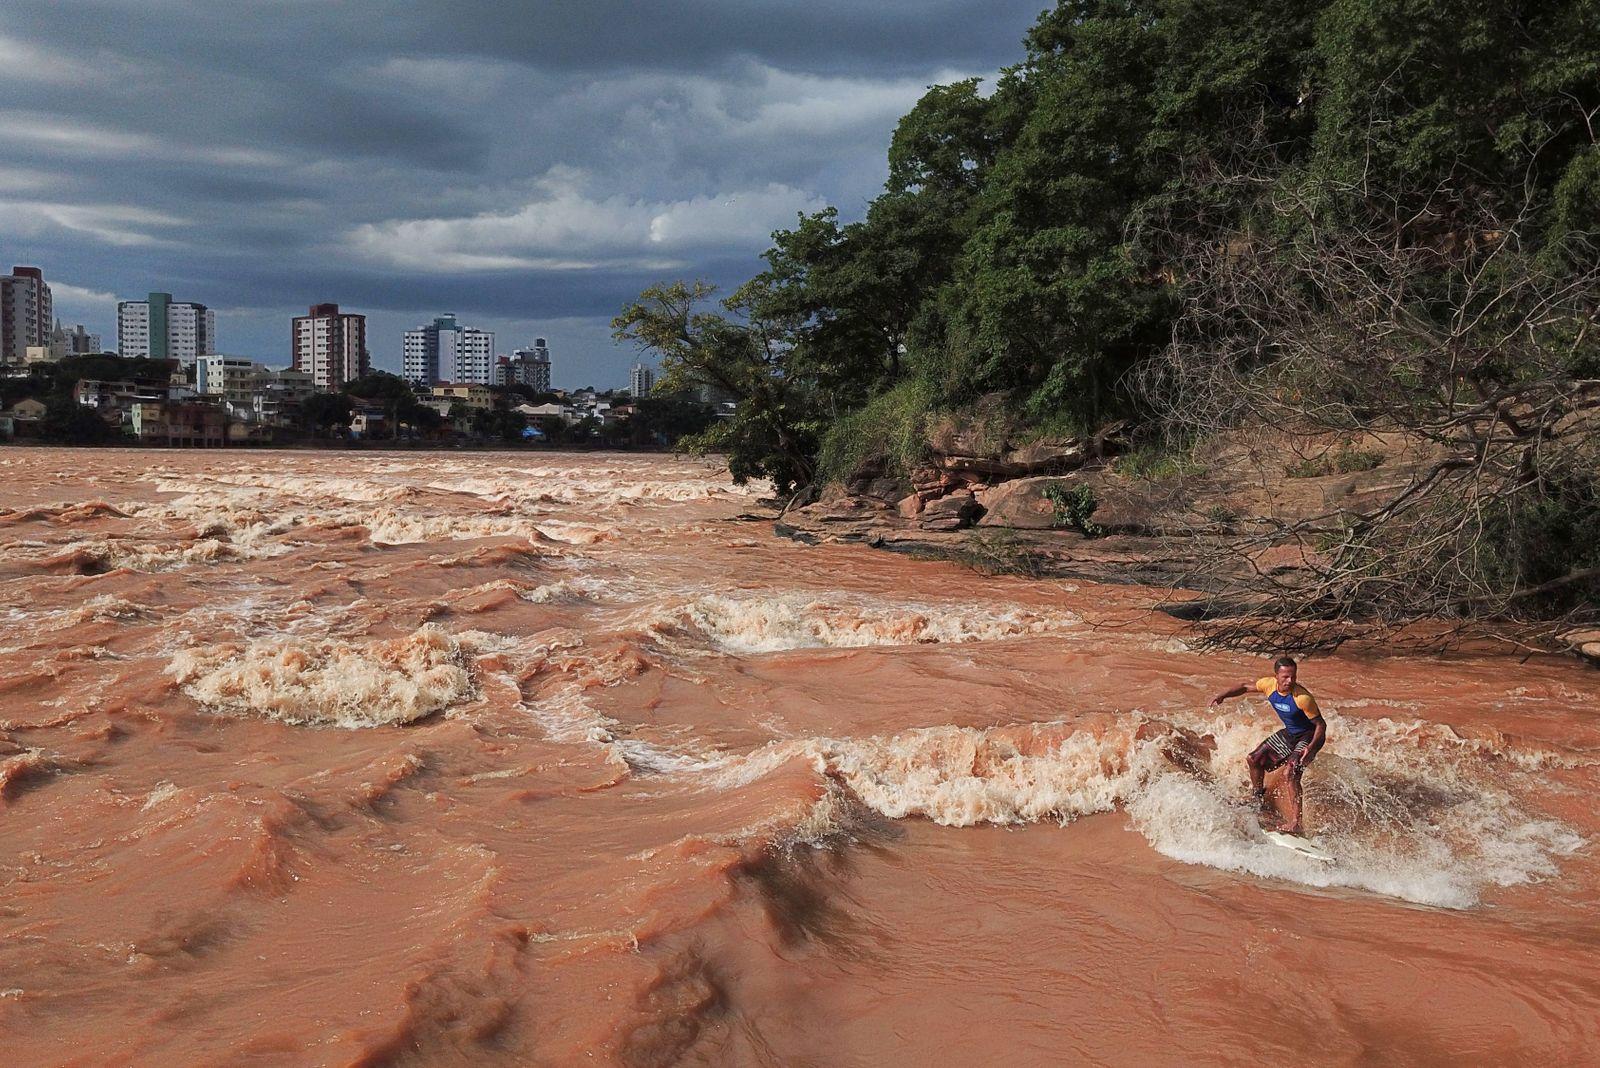 TOPSHOT-BRAZIL-SURF-RIVER